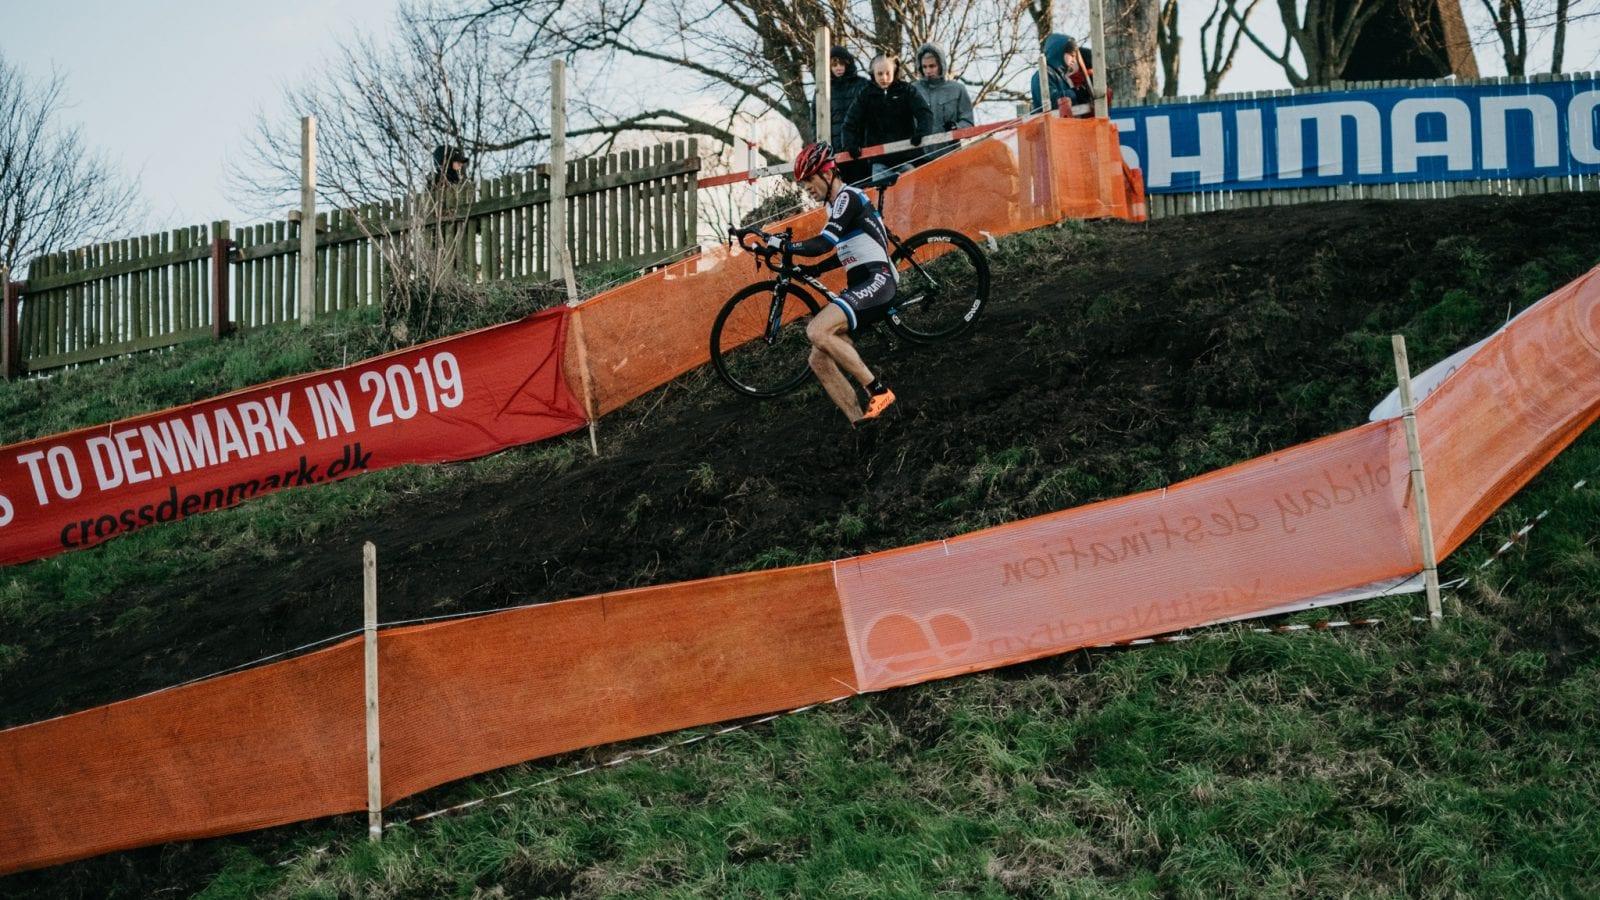 Joachim Parbo 2017 AltomCykling.dk ©Foto Bechbox.dk / Mikkel Bech